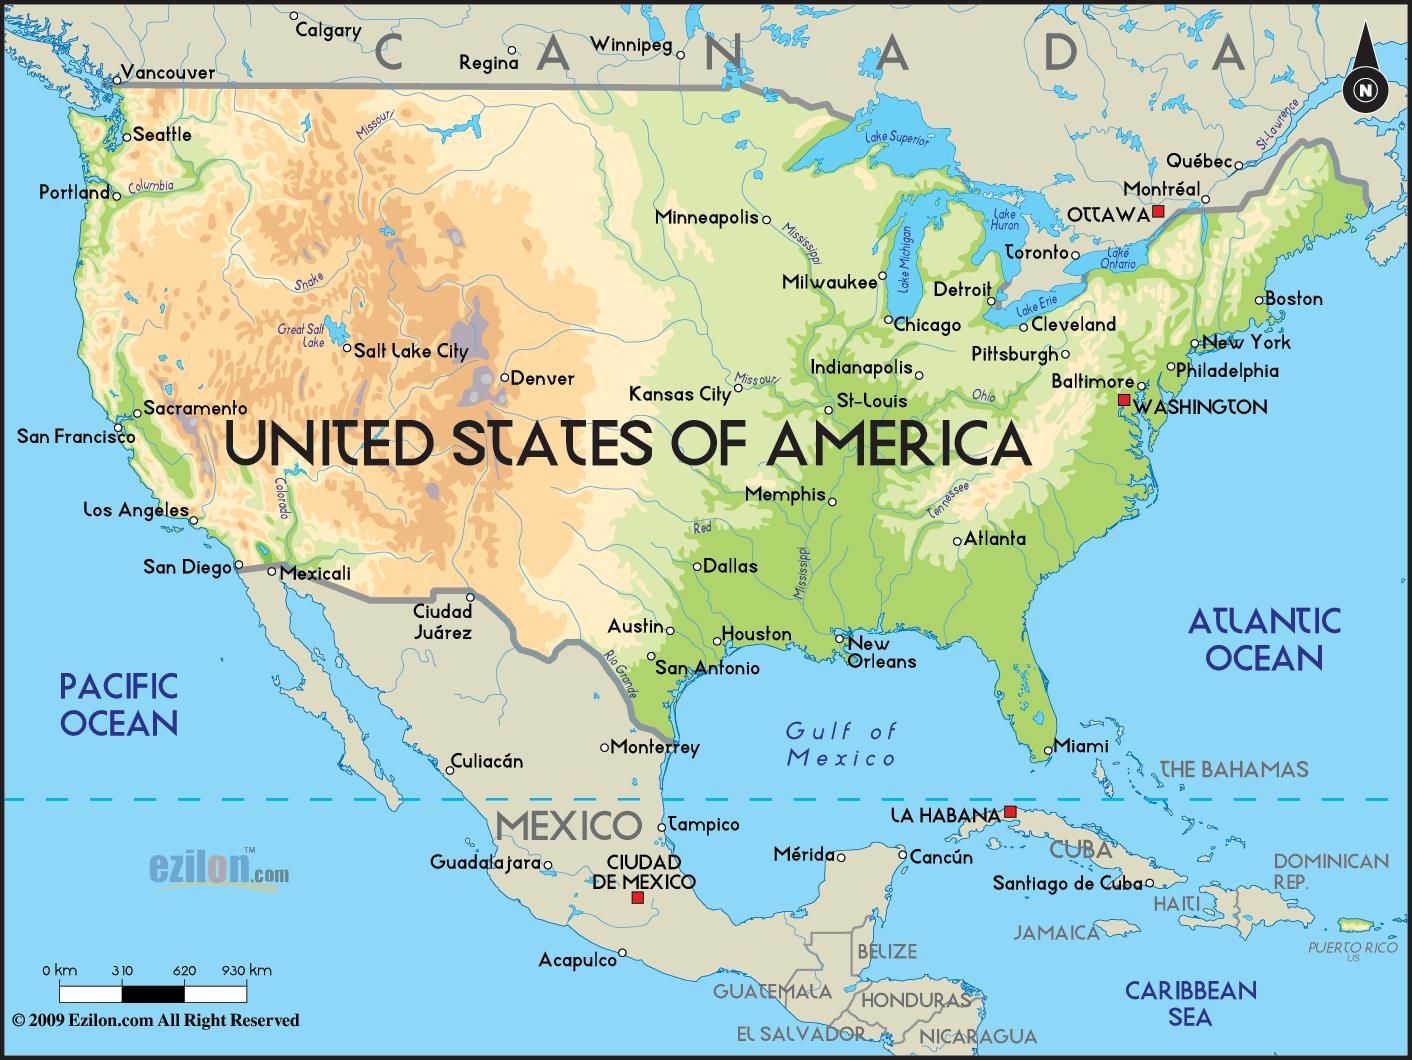 Karta Amerike Drzave Drzave Karta Amerike Sjeverna Amerika